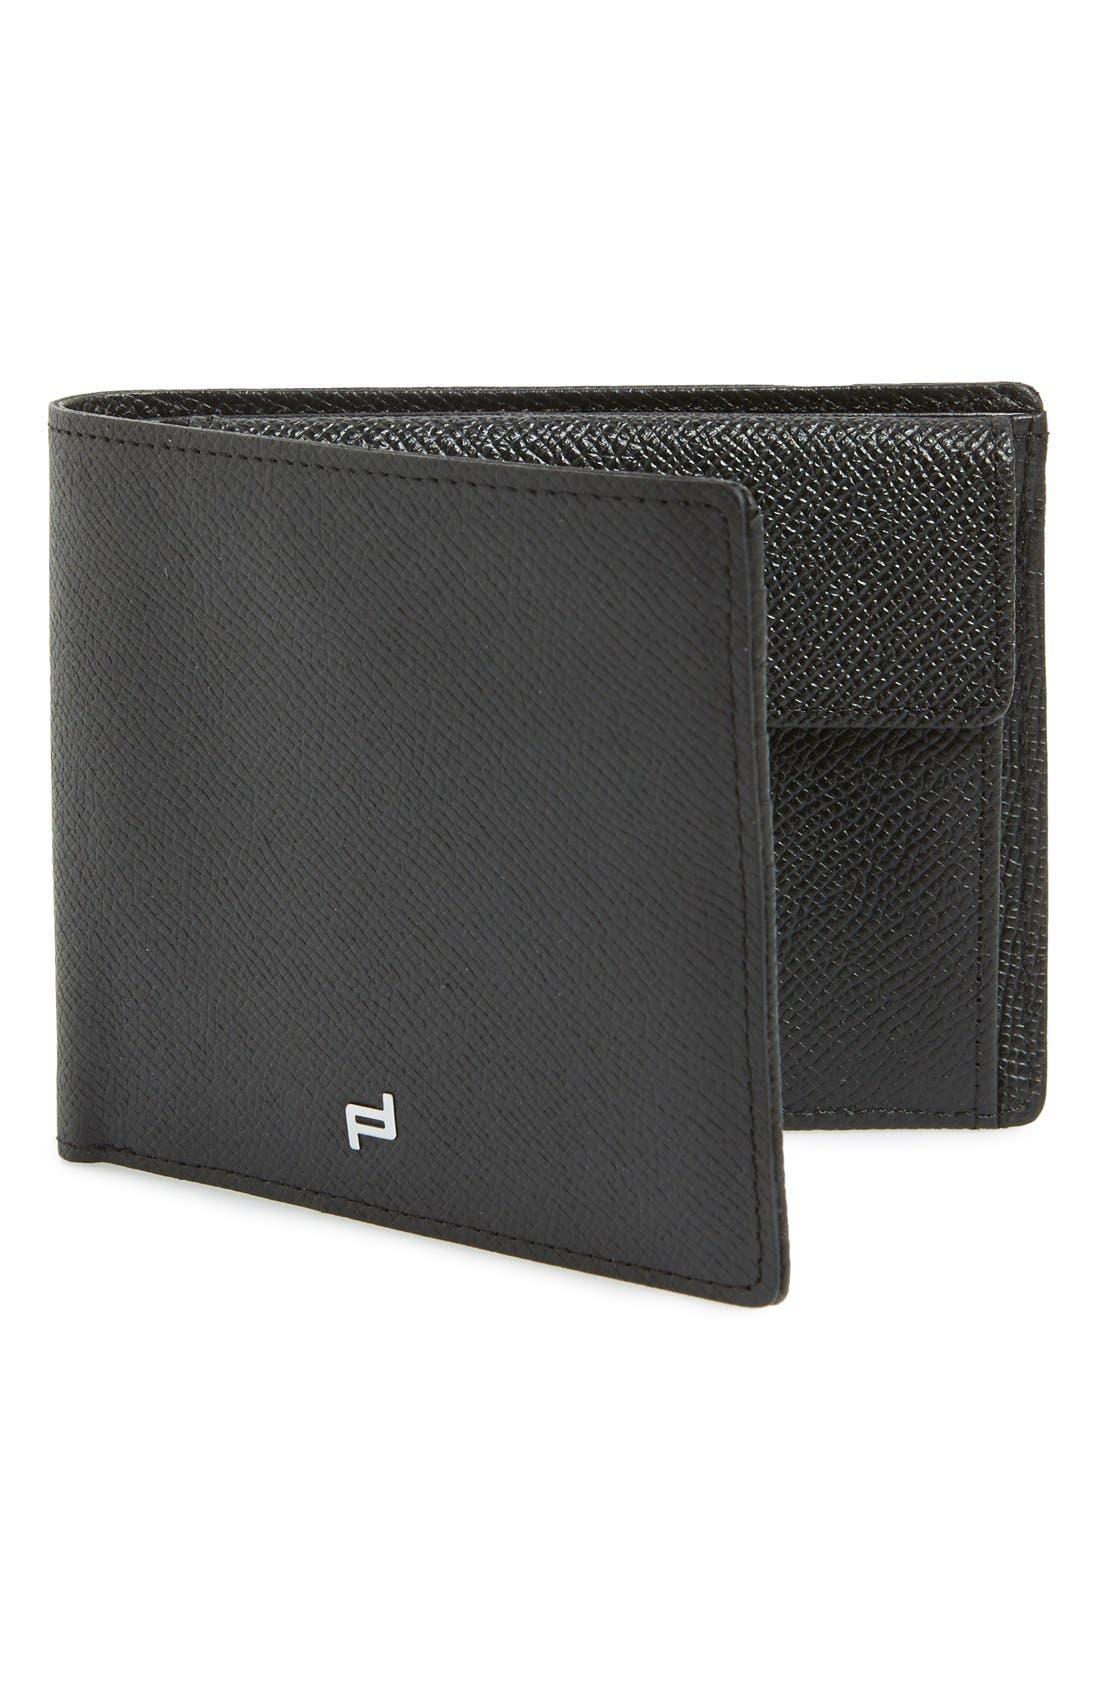 PORSCHE DESIGN 'French Classic 3.0' Leather Billfold Wallet